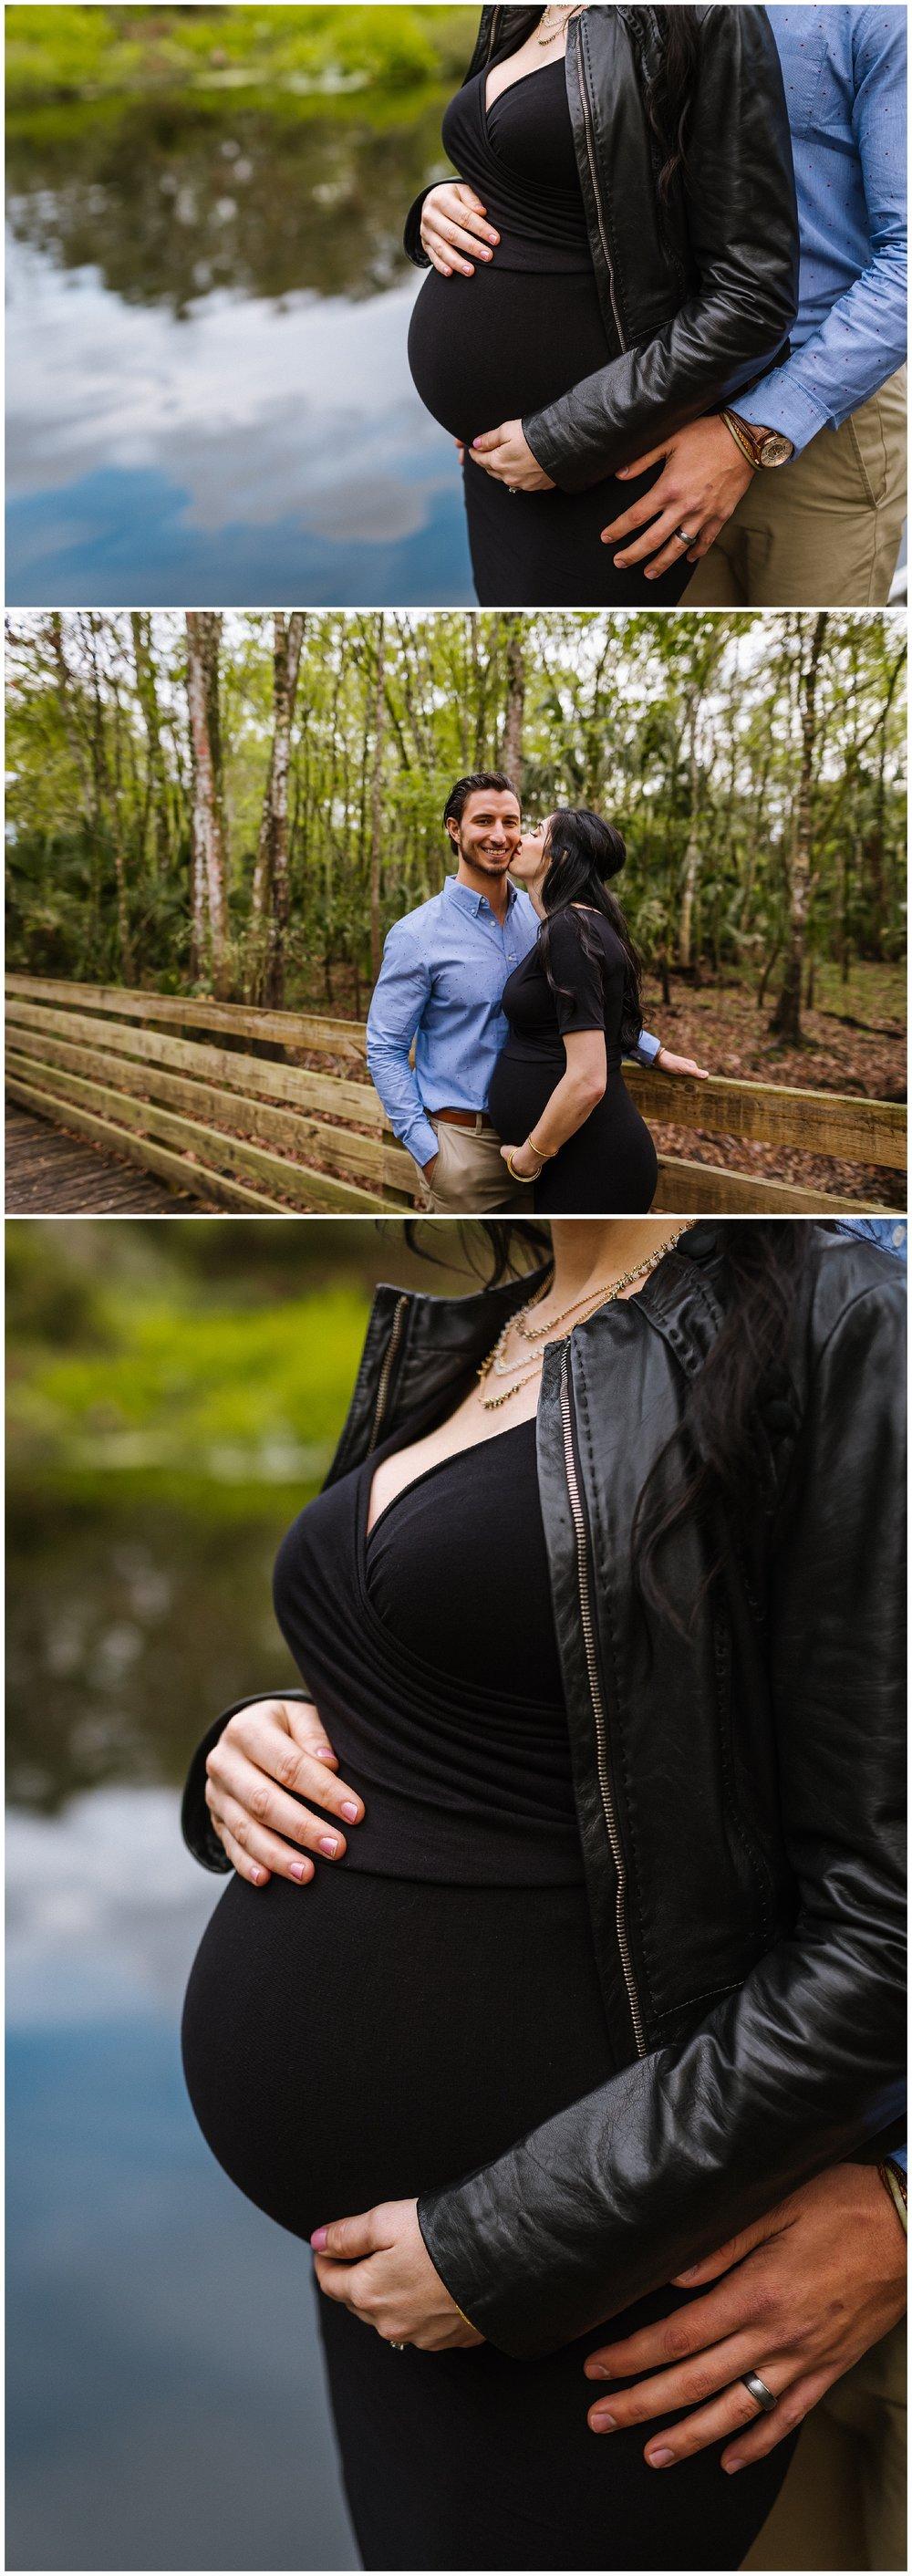 Tampa-maternity-photographer-morris-bridge-park-hip-tight-black-dress-woods_0008.jpg